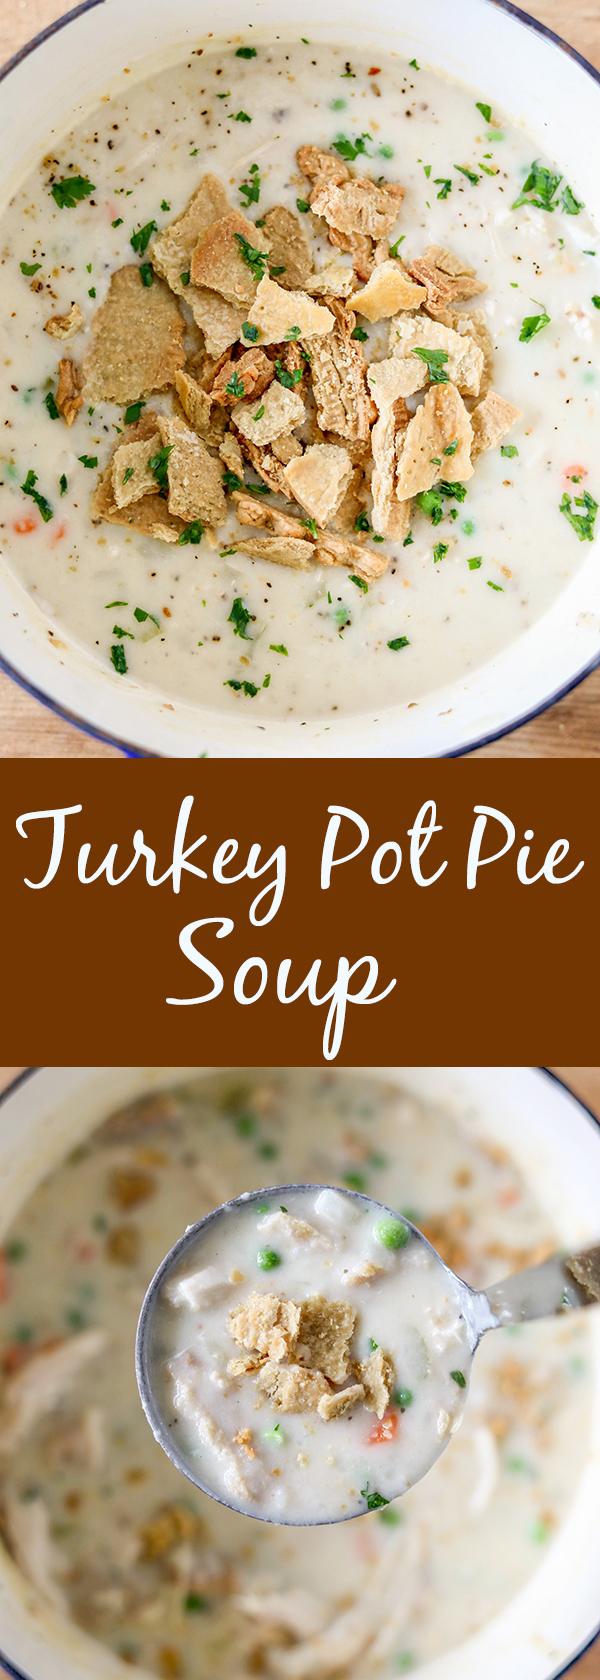 Easy Turkey Pot Pie Soup